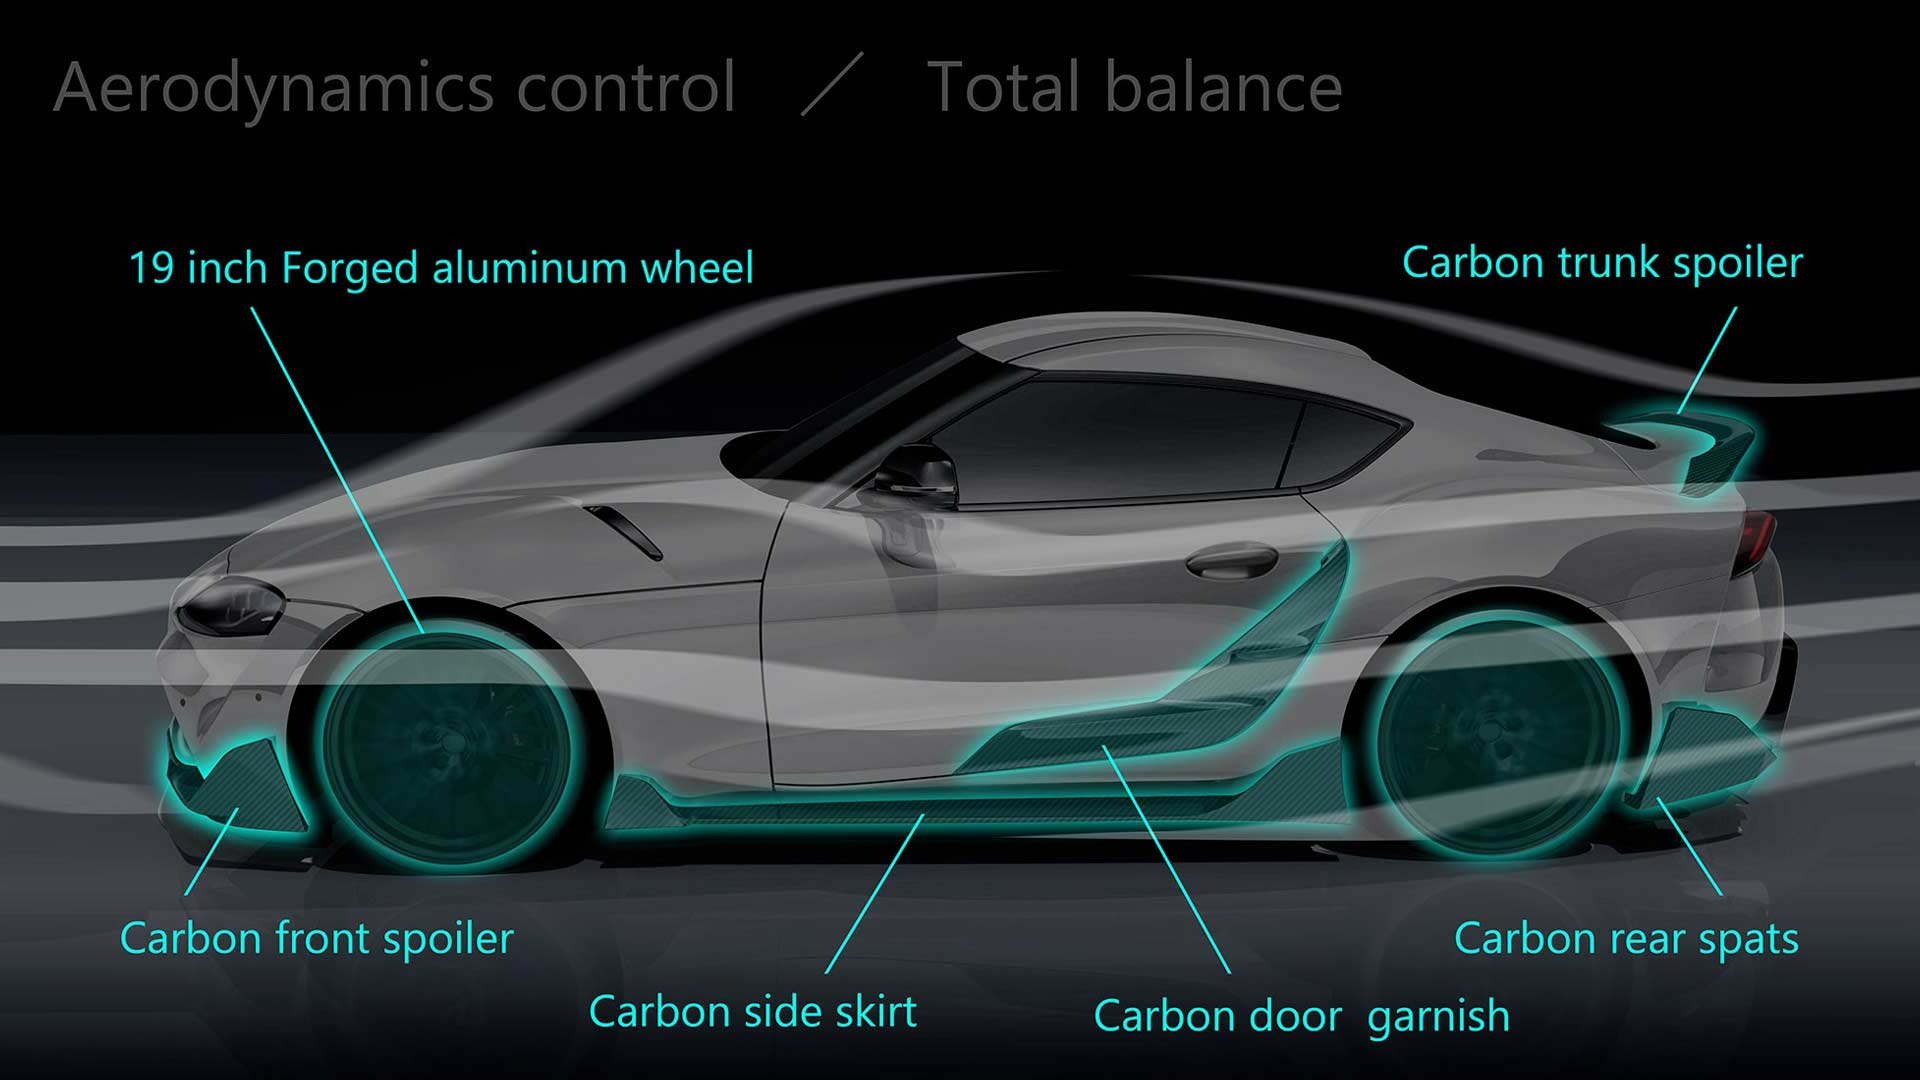 2020-Toyota-Supra-TRD-parts-concept_5